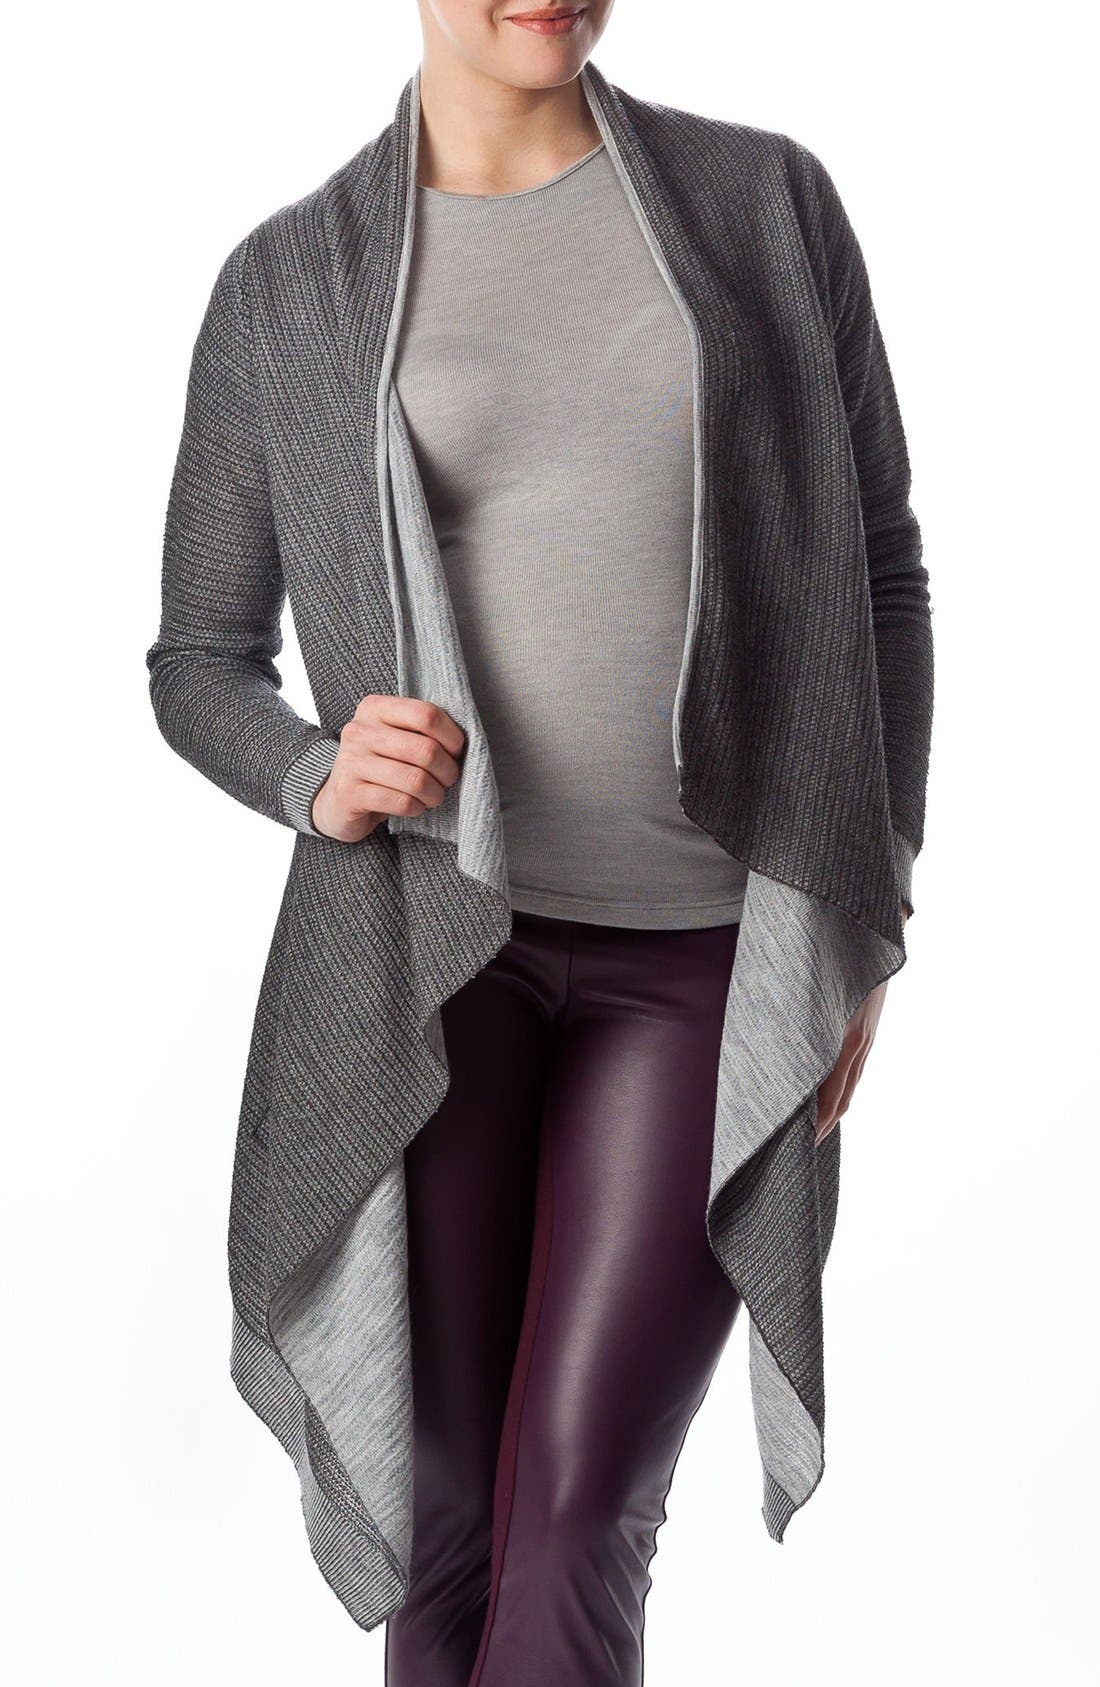 Alternate Image 1 Selected - PIETRO BRUNELLI 'Merano' Maternity Drape Front Cardigan